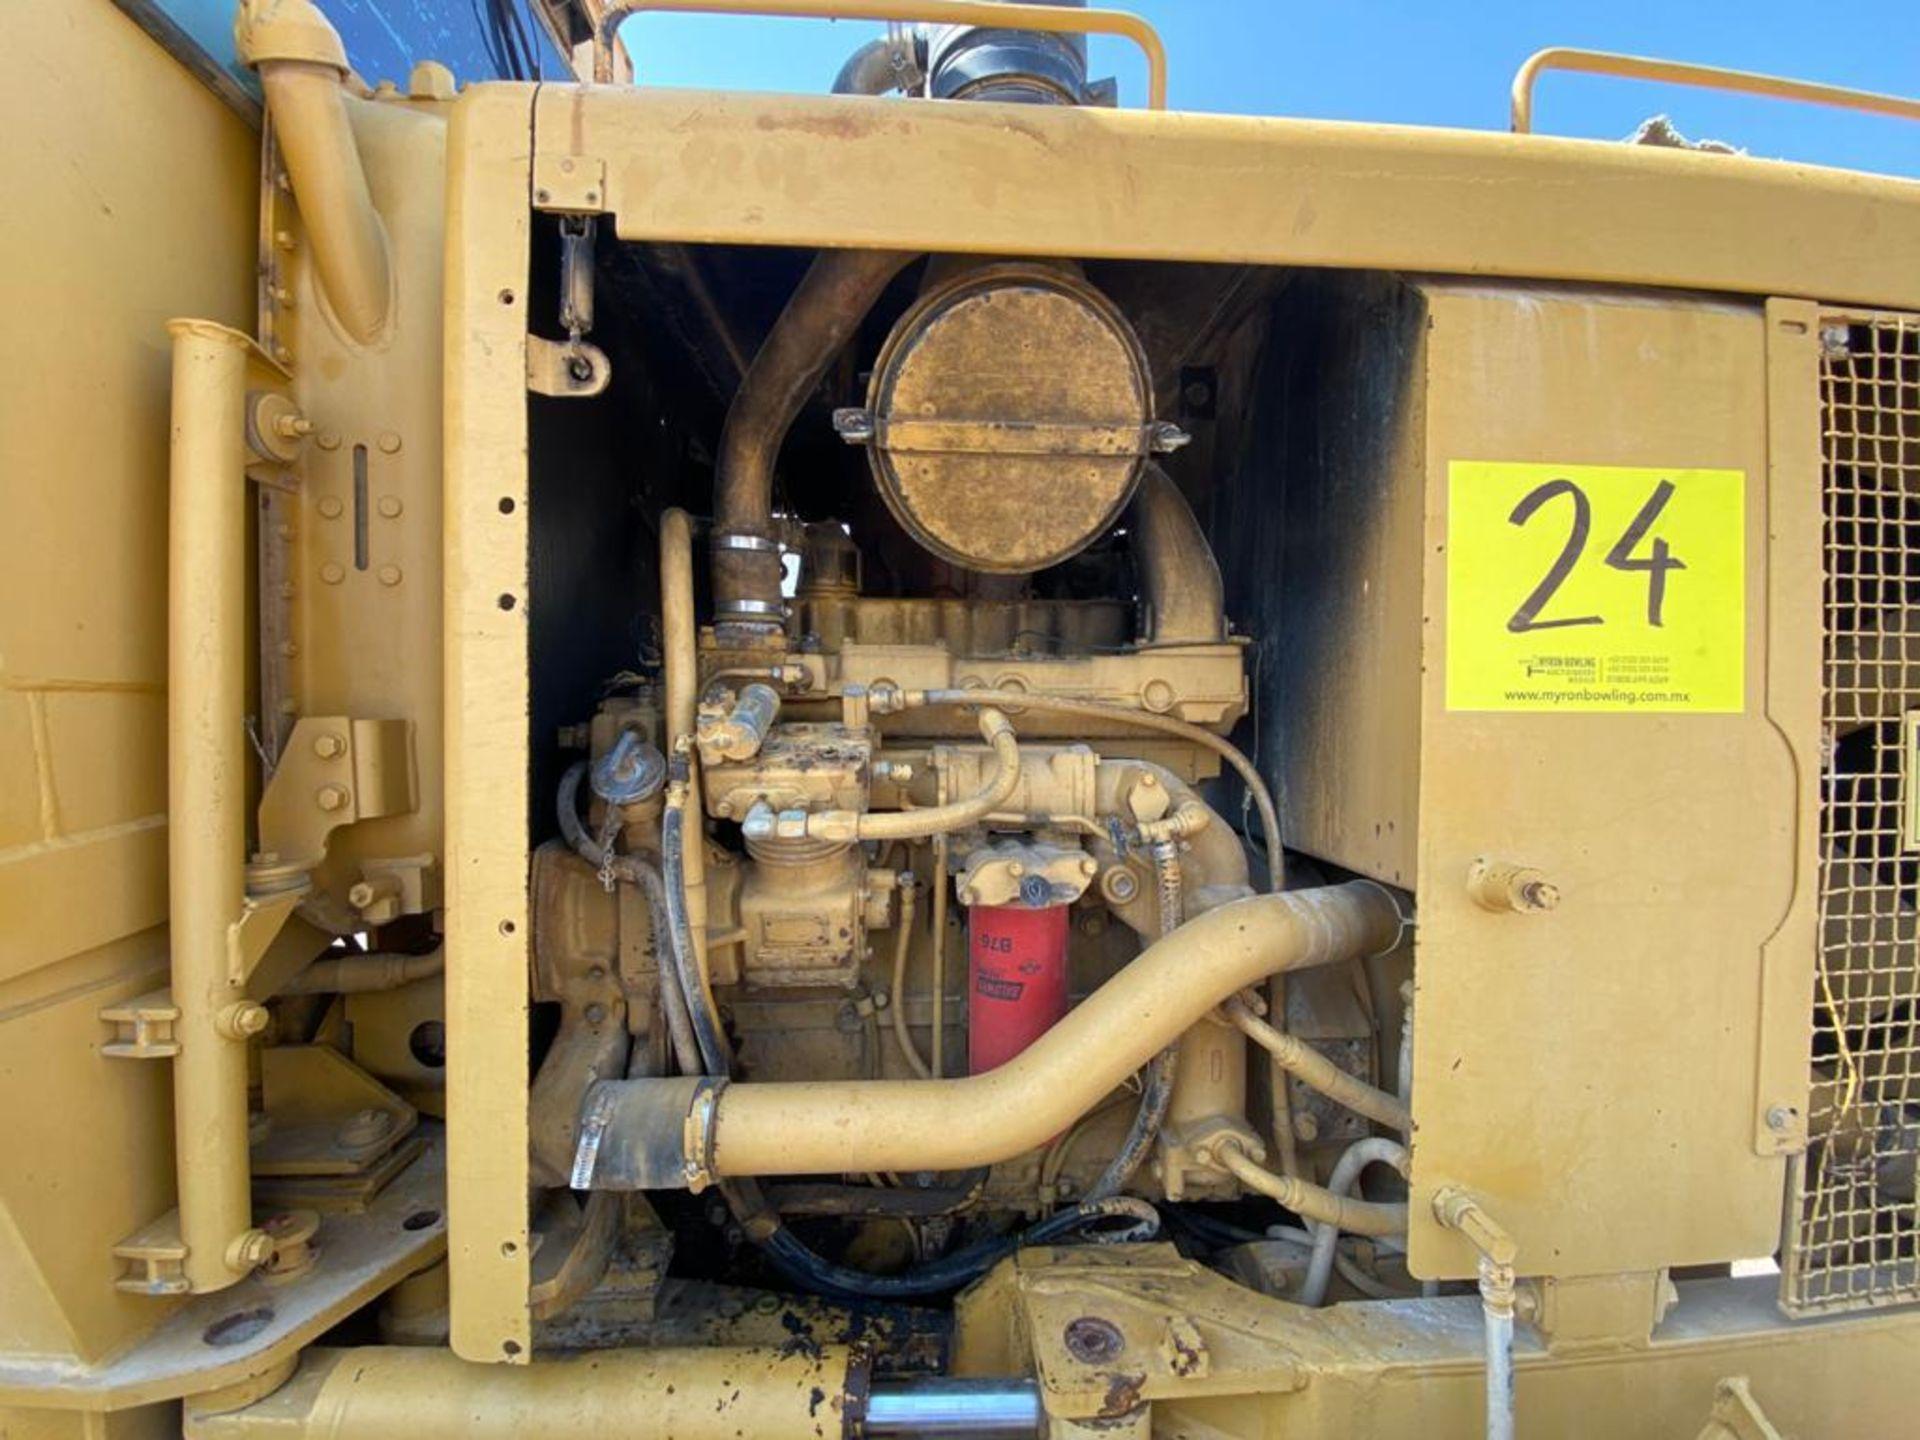 Caterpillar 120G Motor Grader, Serial number 87V09646, Motor number PQ883-2/07Z28983 - Image 49 of 61